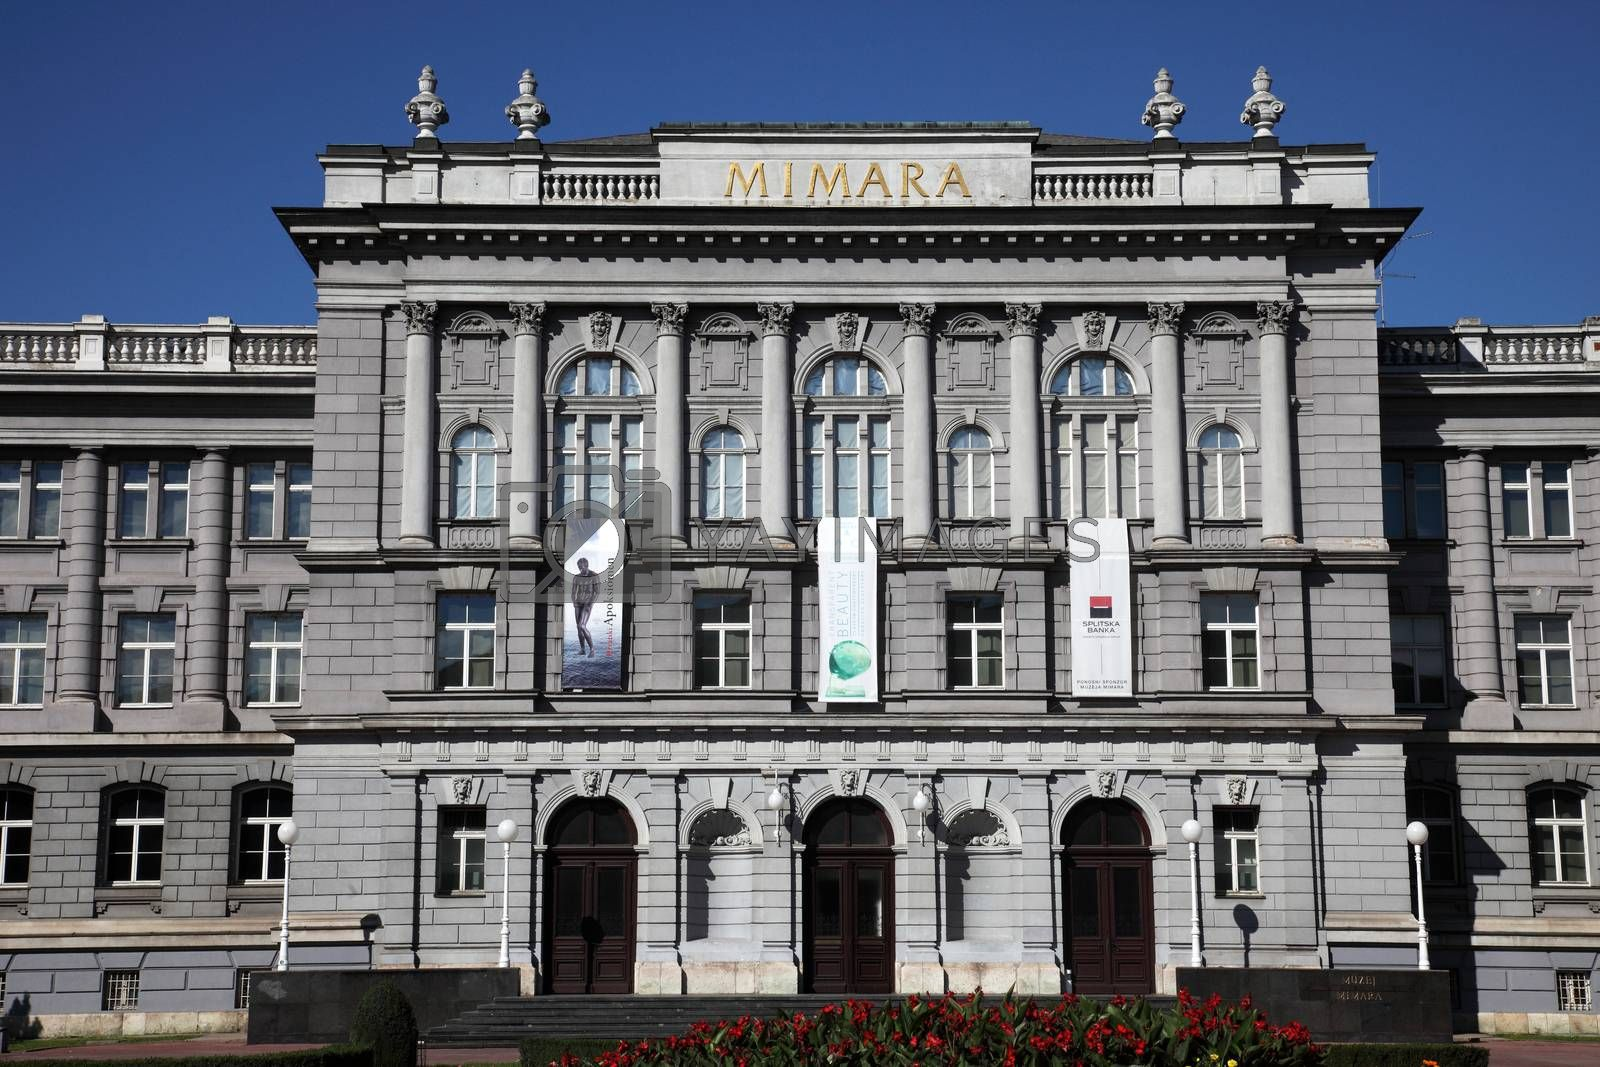 Mimara Museum in Zagreb, Croatia